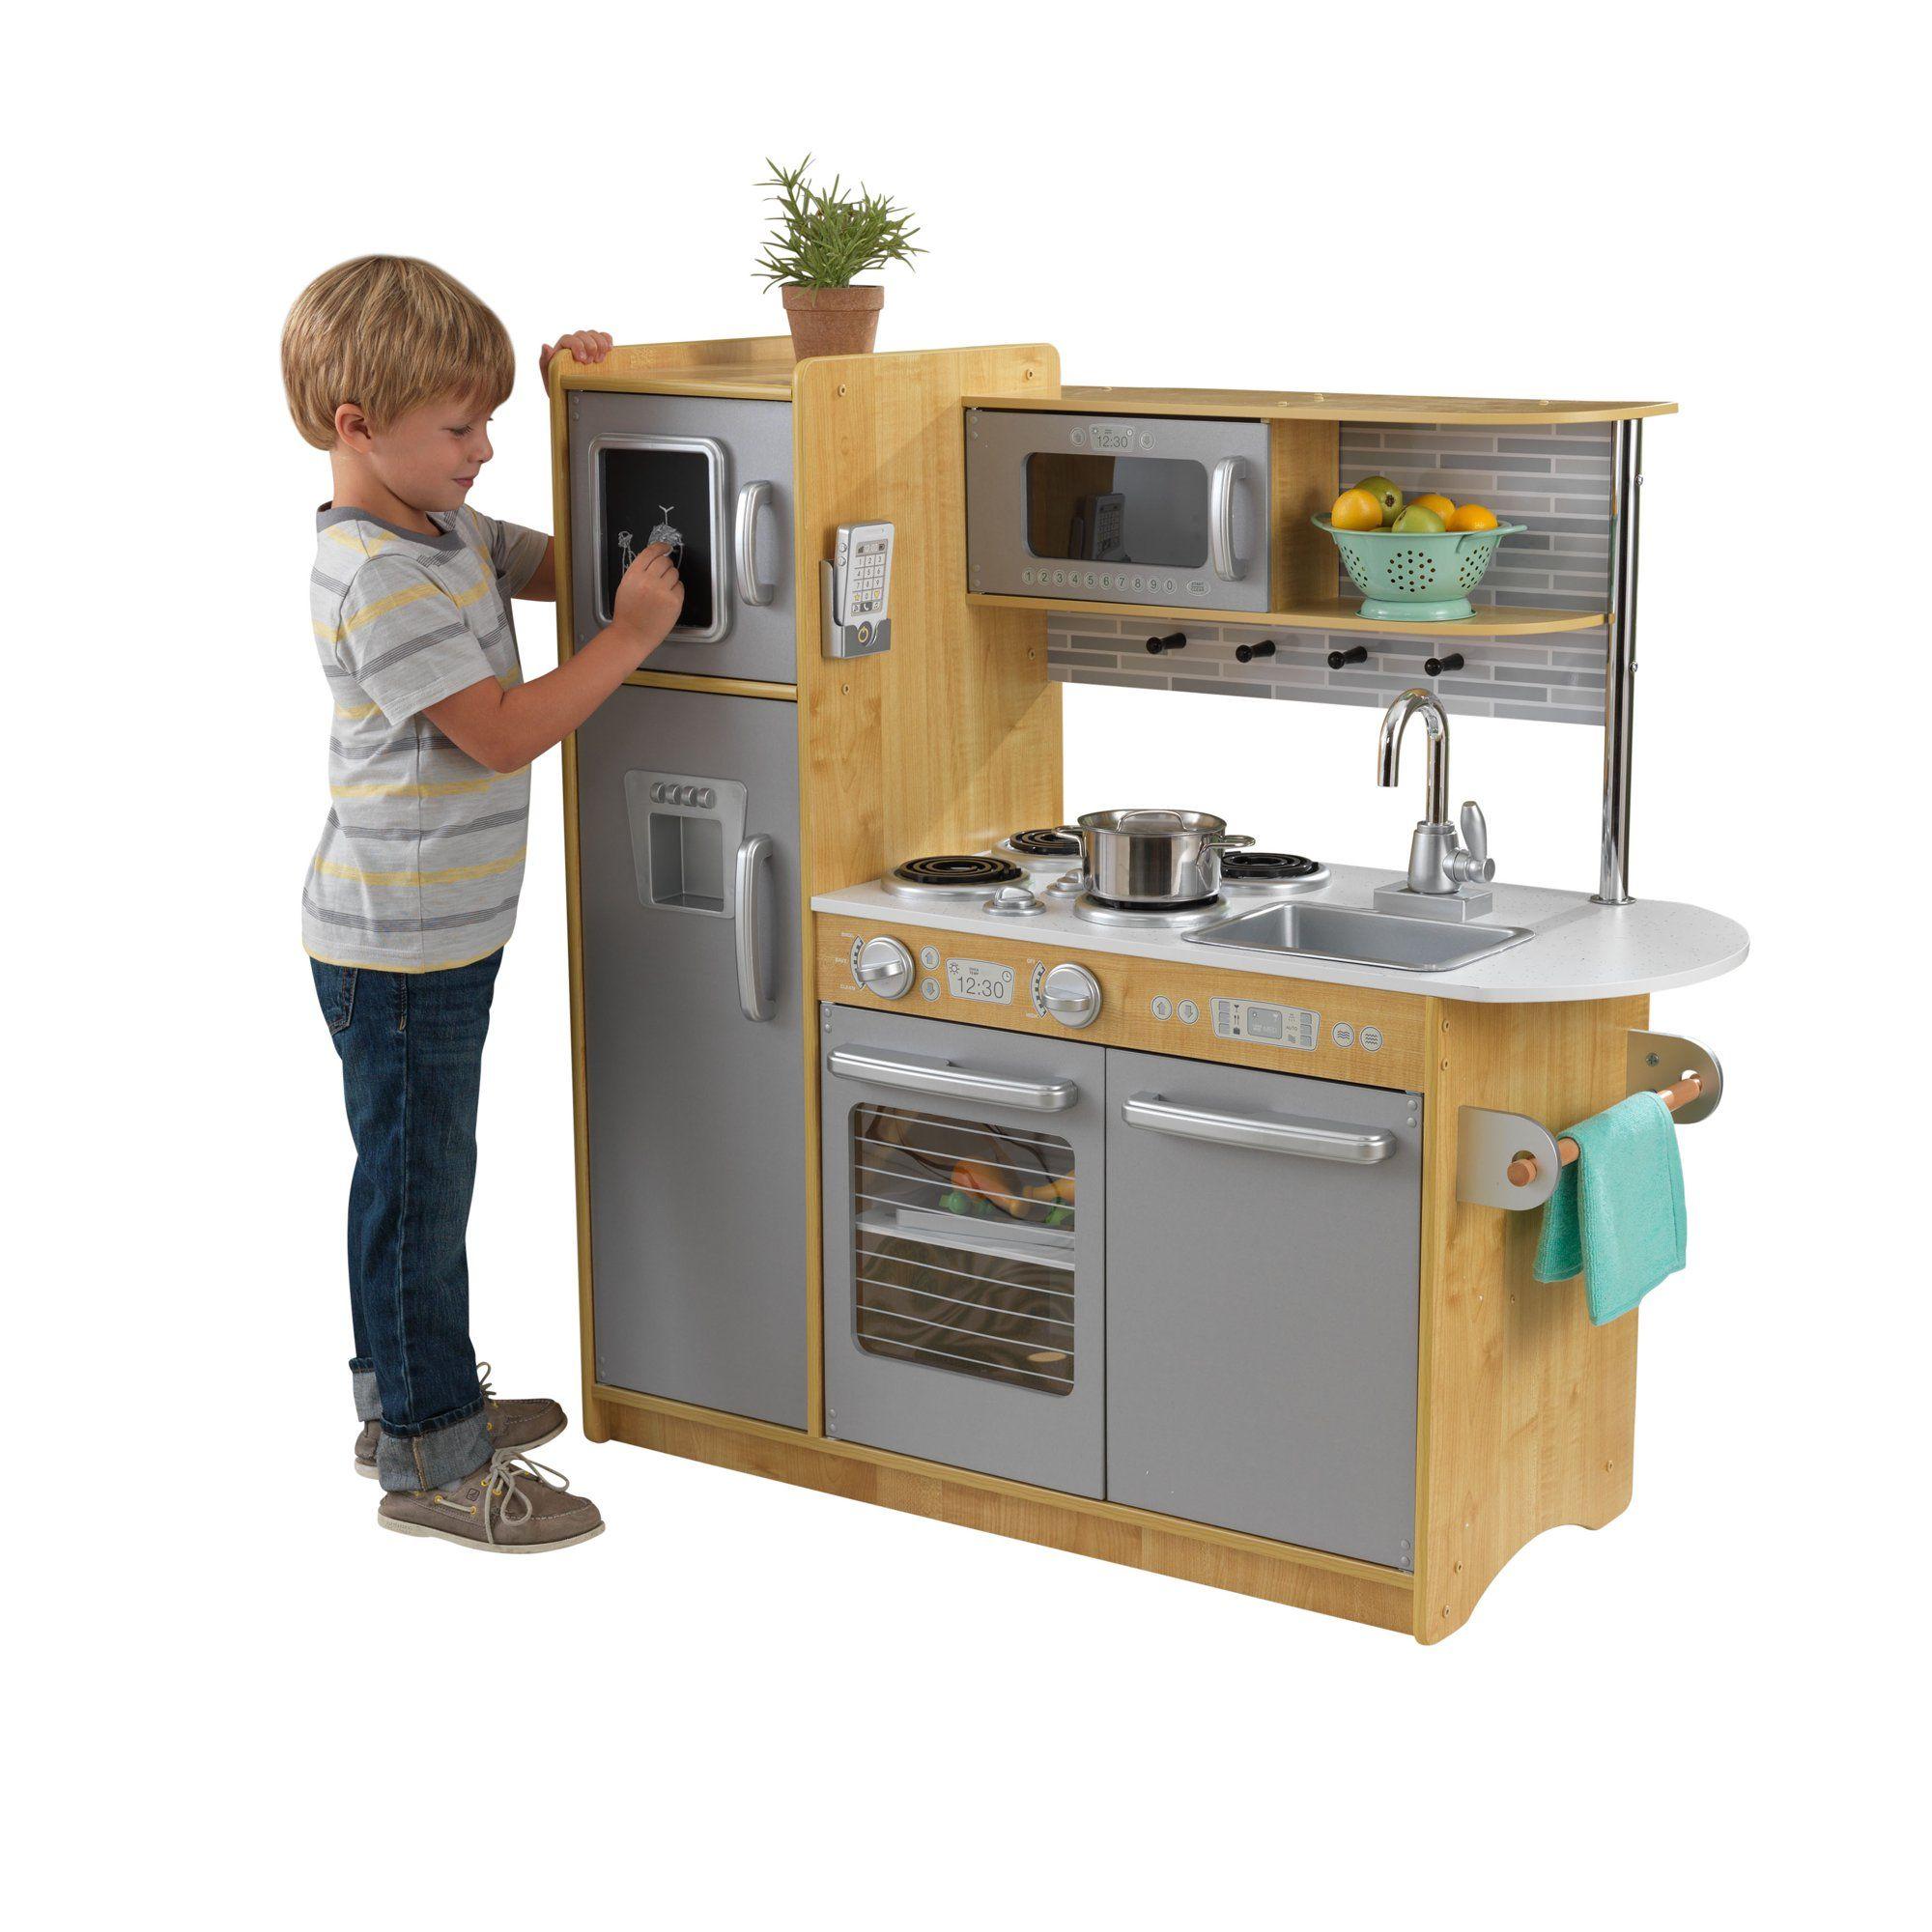 Kidkraft Uptown Natural Play Kitchen Walmart Com In 2021 Wooden Play Kitchen Play Kitchen Play Kitchen Sets